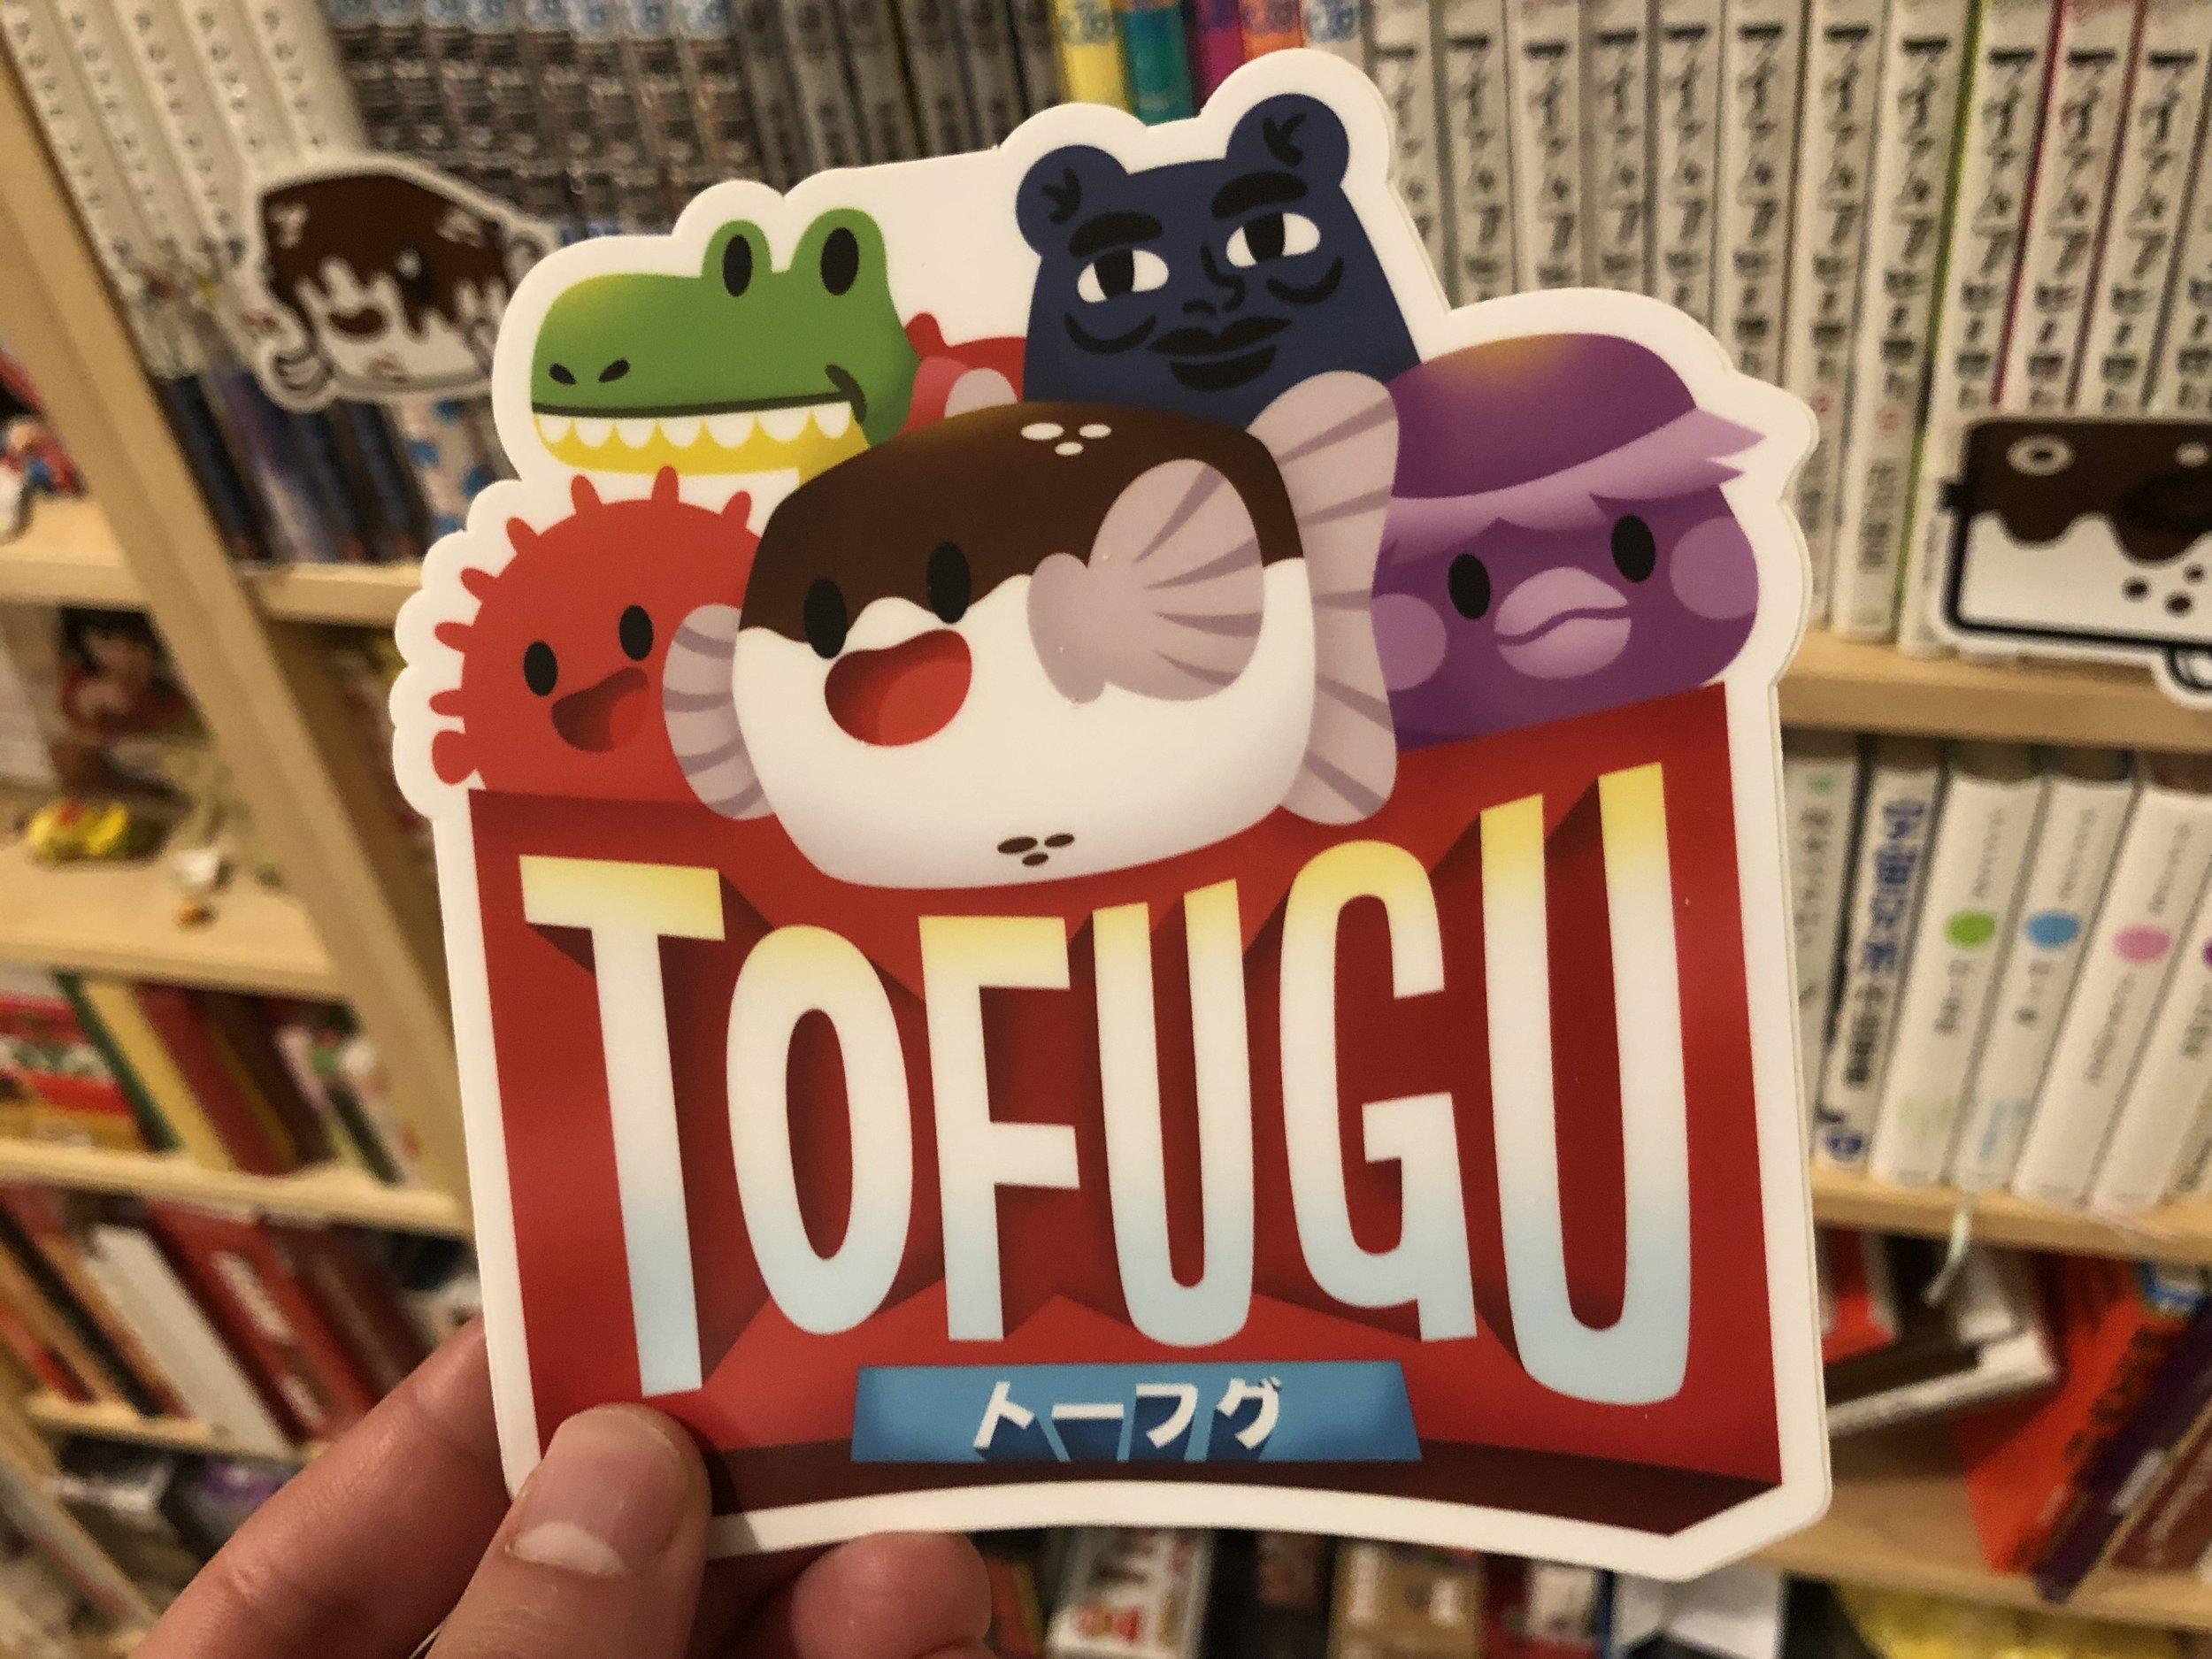 Tofugu and Friends